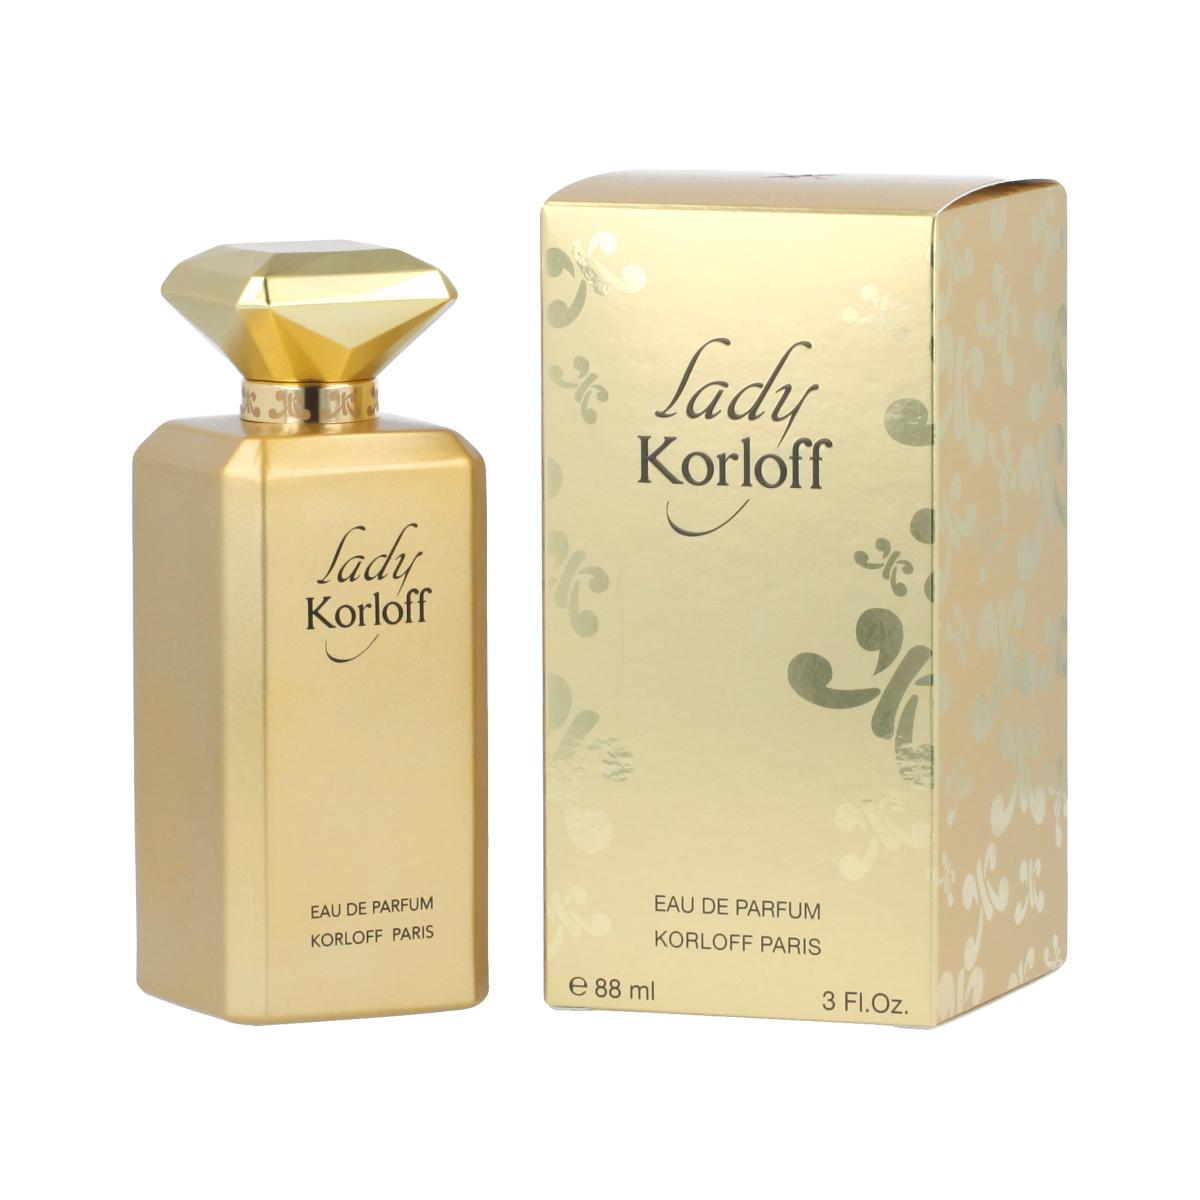 Korloff Lady Korloff Eau De Parfum 88 ml (woman) 82106